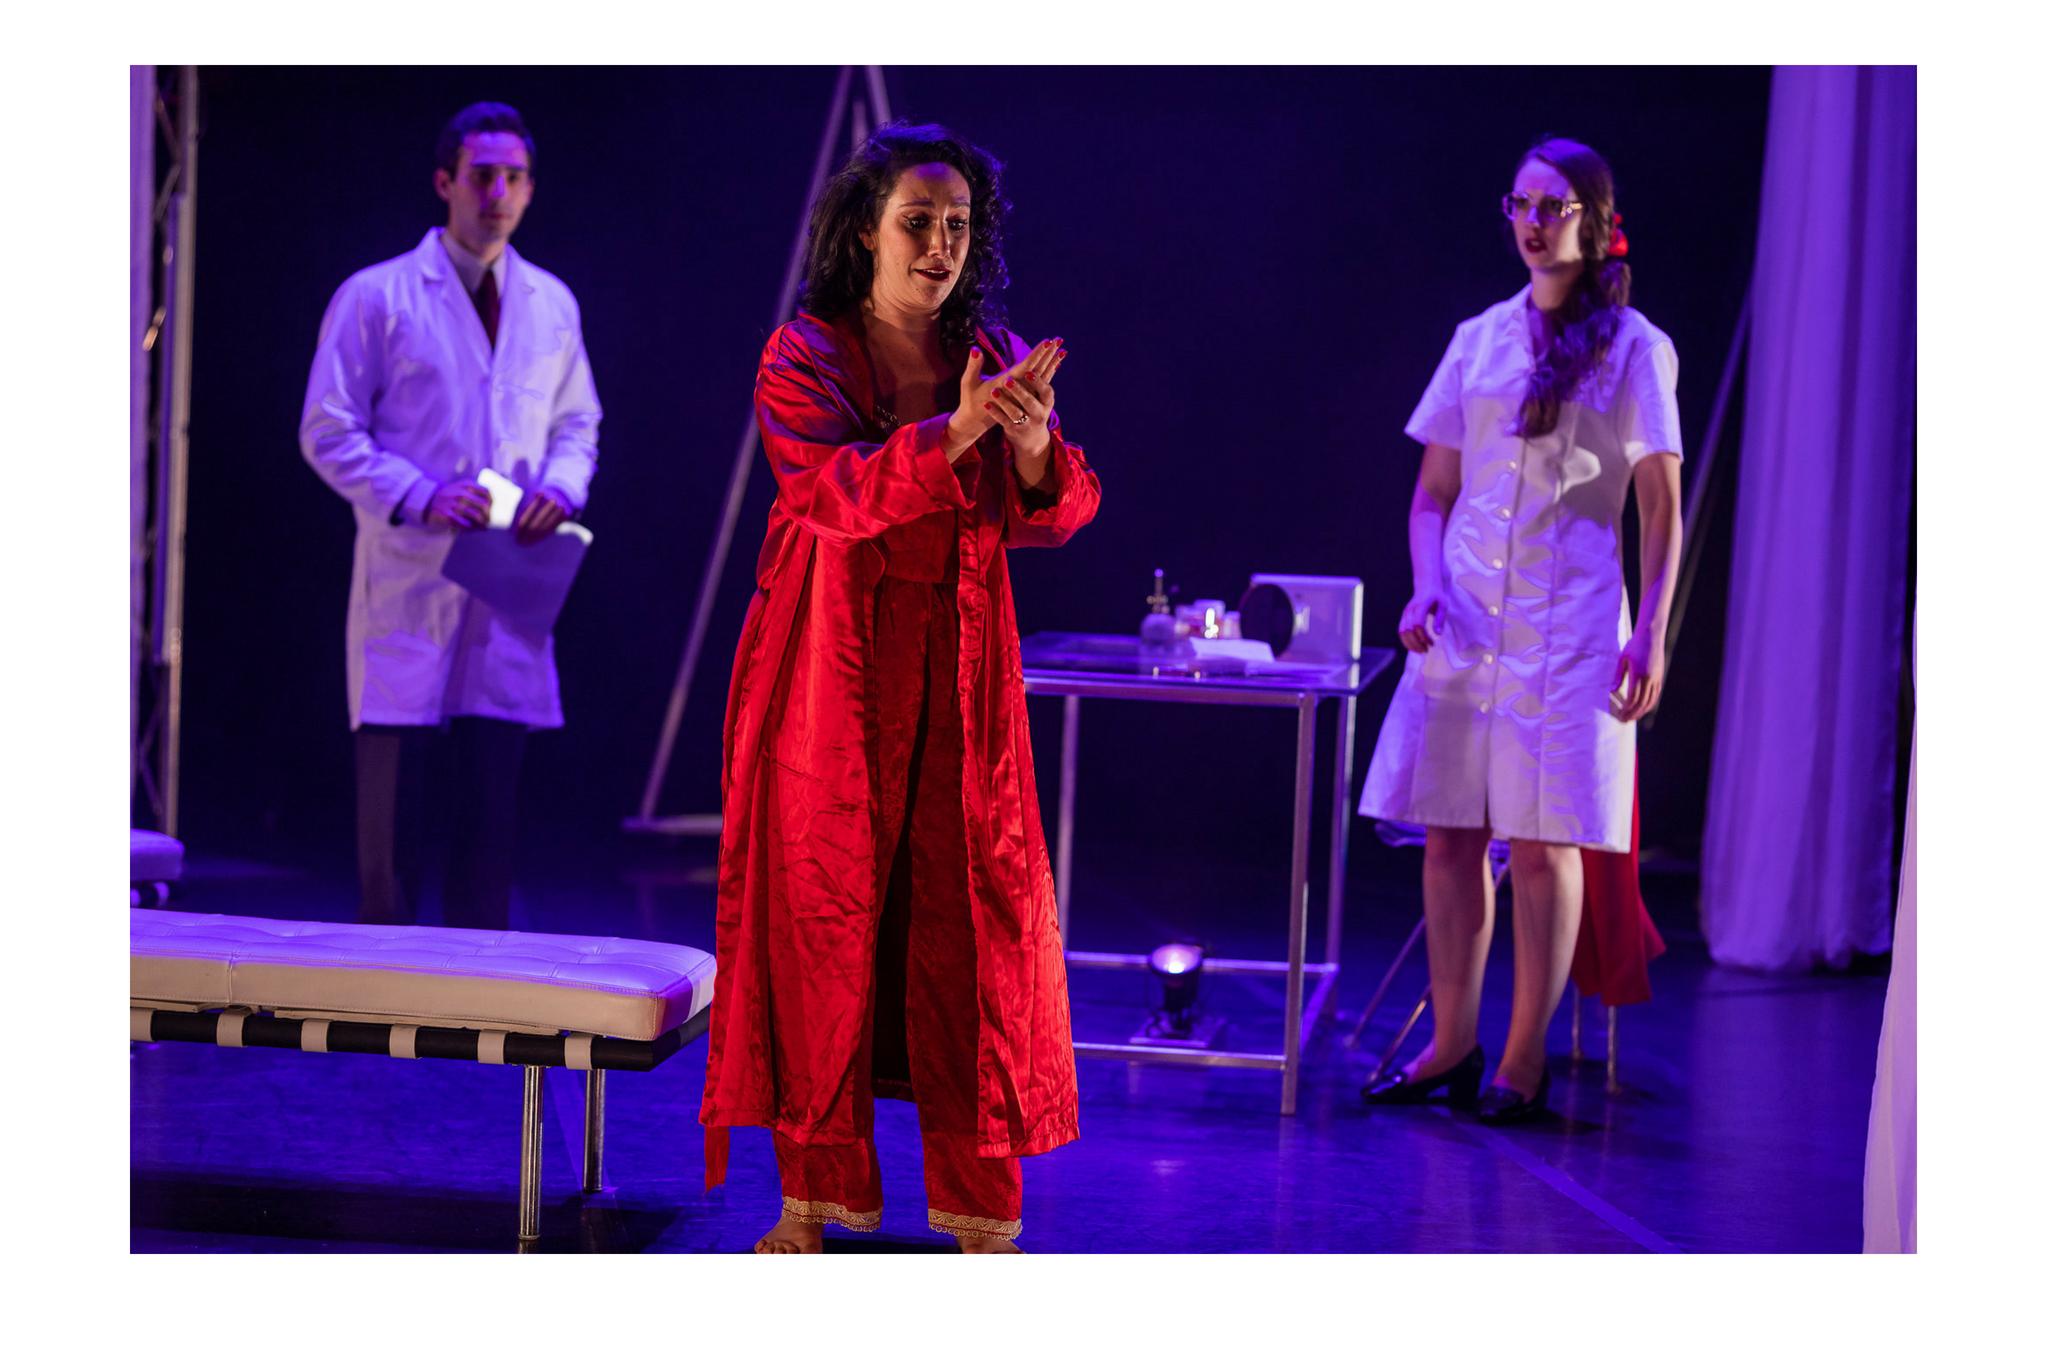 Felix Teich (Doctor), Stefanie Resnick (Lady Macbeth), and Bailie de Lacy (Gentlewoman) in Macbeth, CSC2, 2018-Photo by Nile Hawver